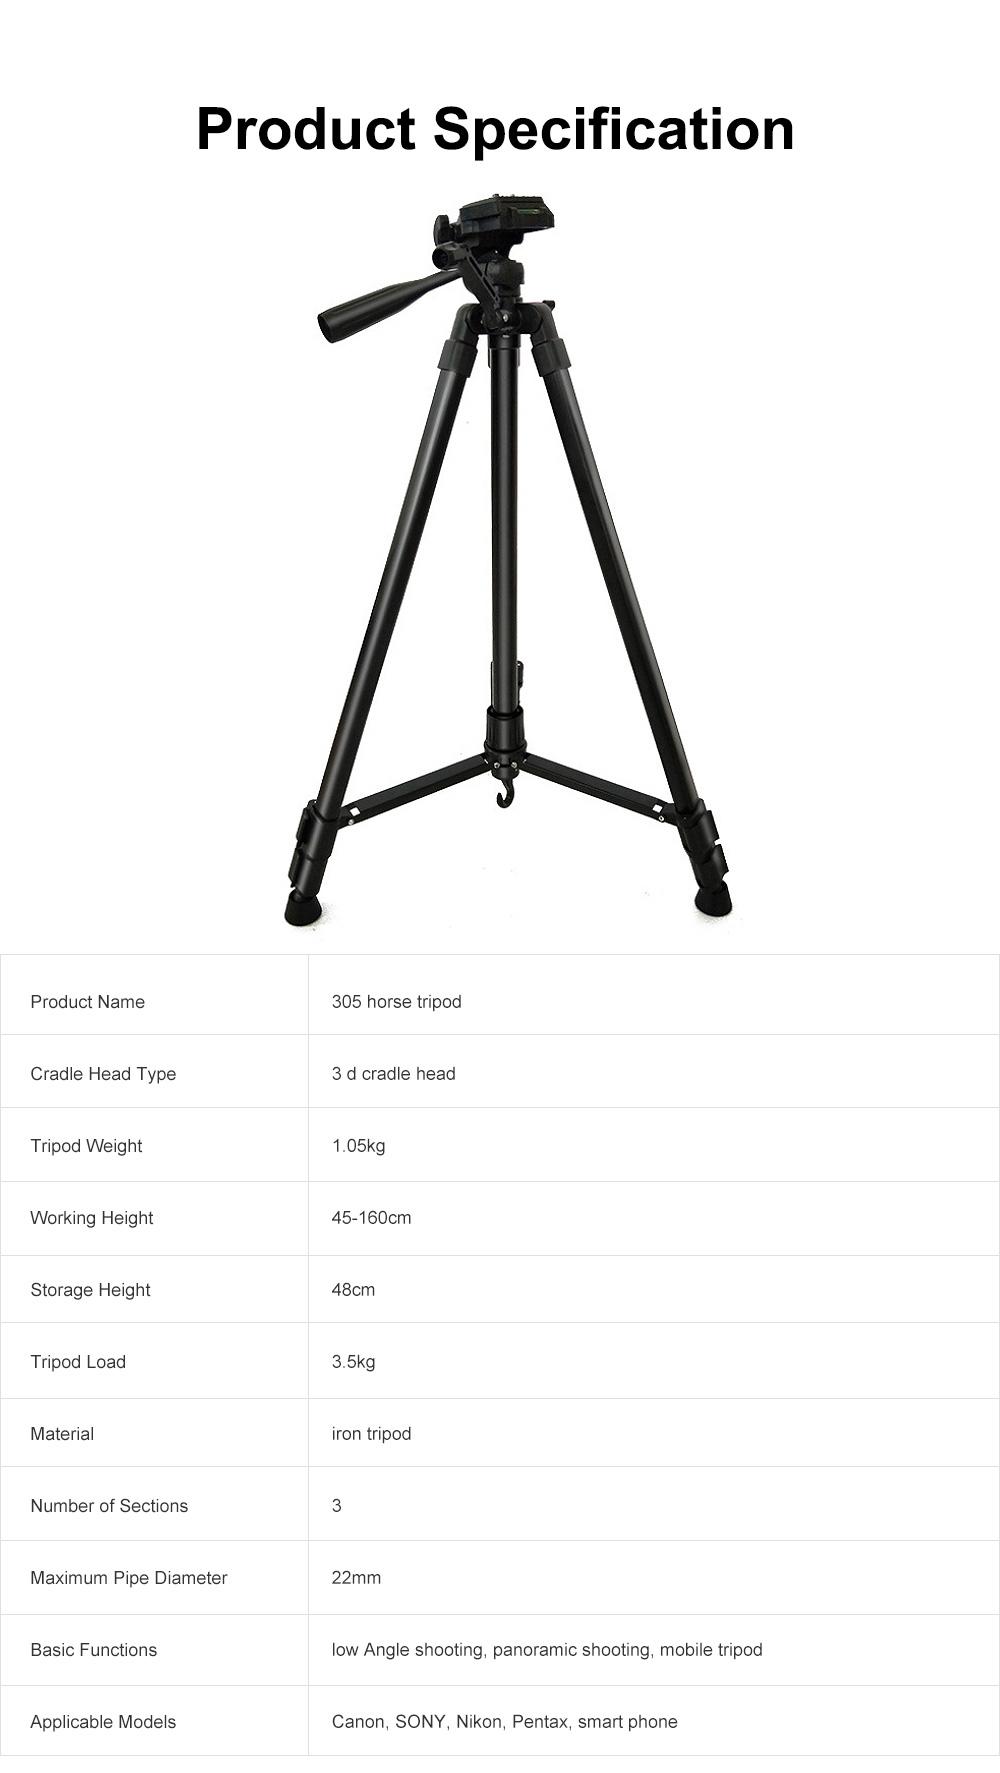 DSLR Camera Tripod with Horseshoe-shaped Design, Multifunctional Photography Camera Lightweight Portable Micro Tripod 6